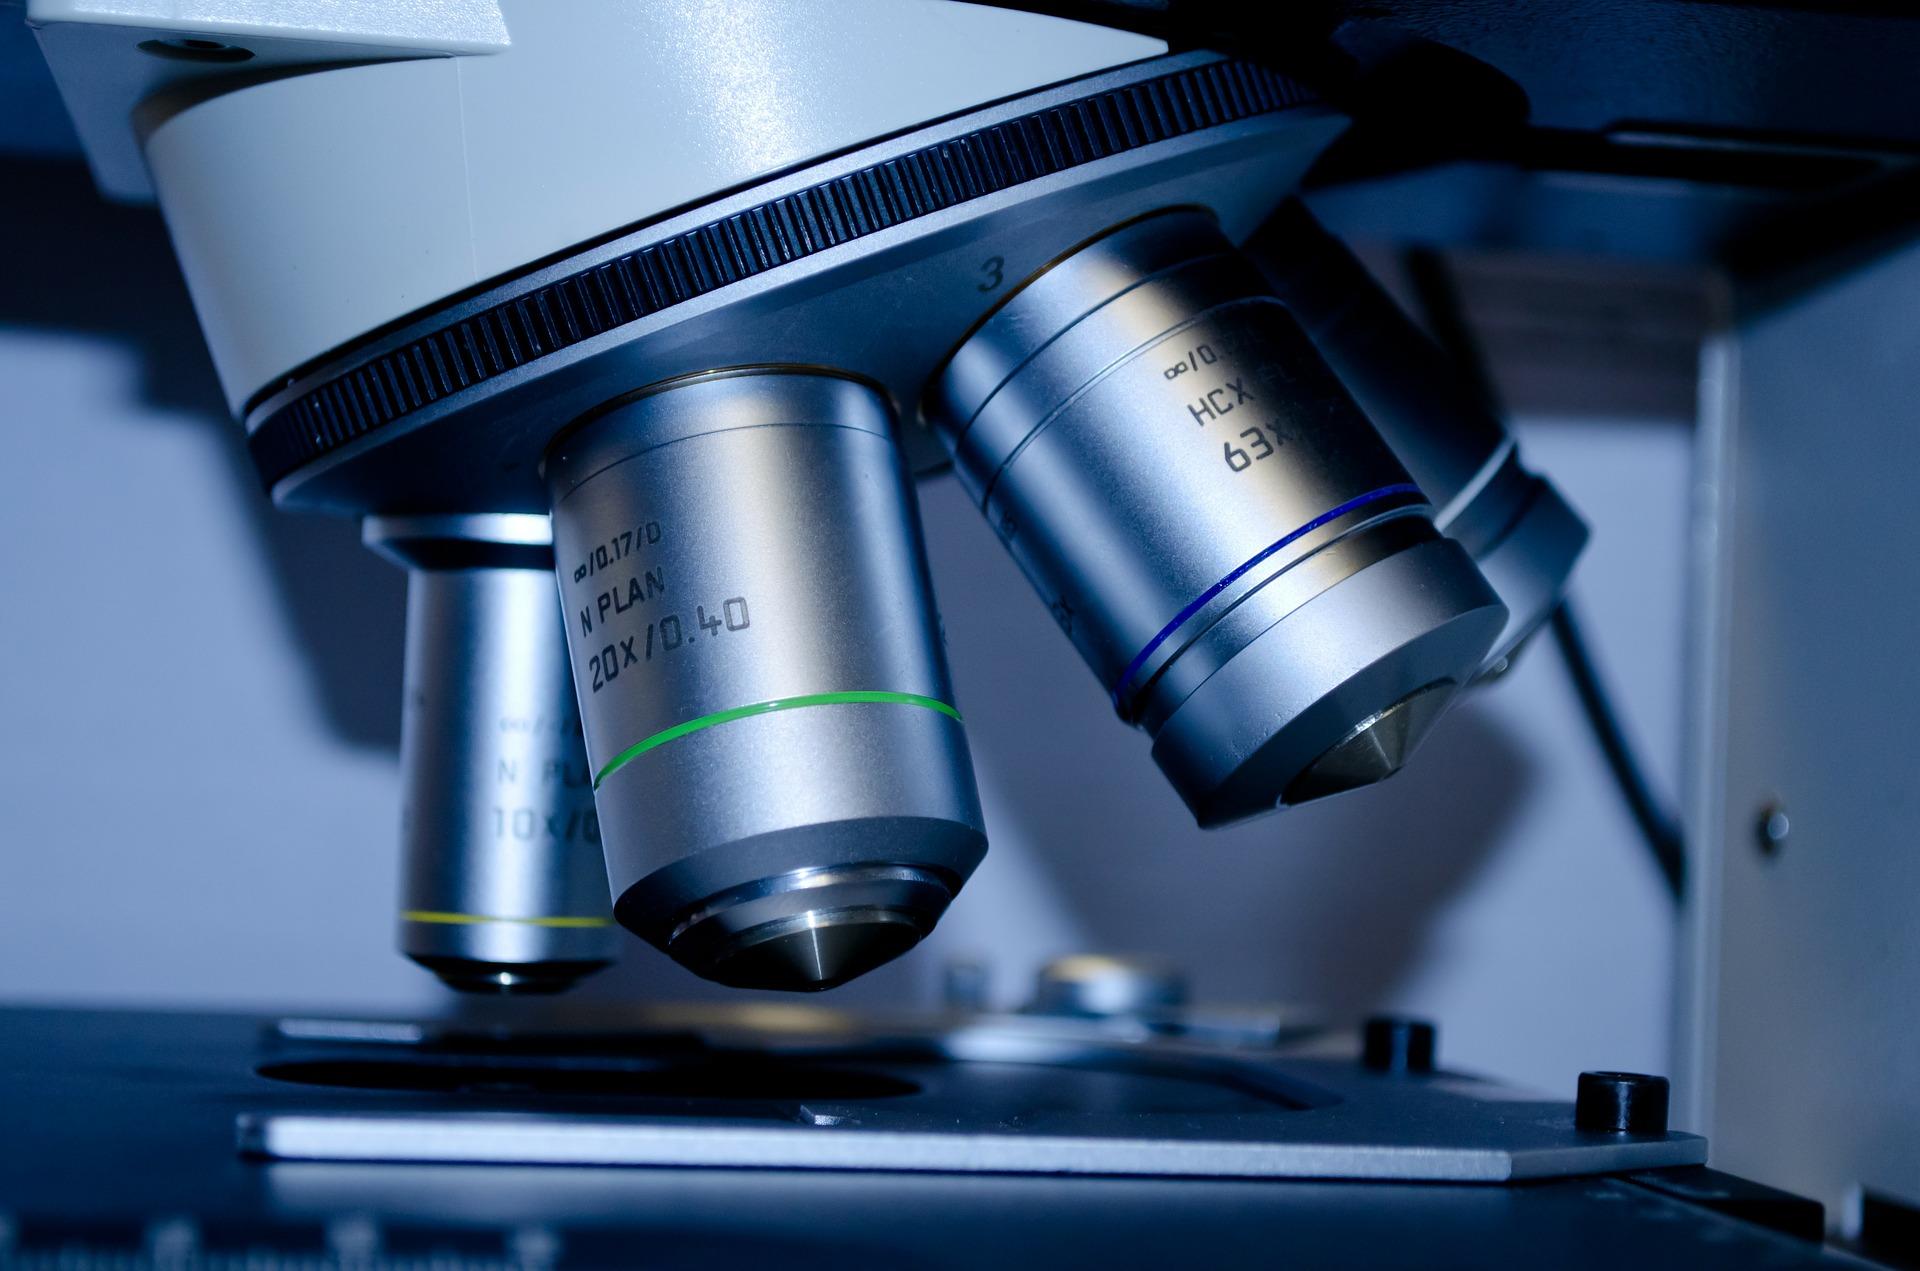 Microscopio. Elementos de laboratorio. Agromay